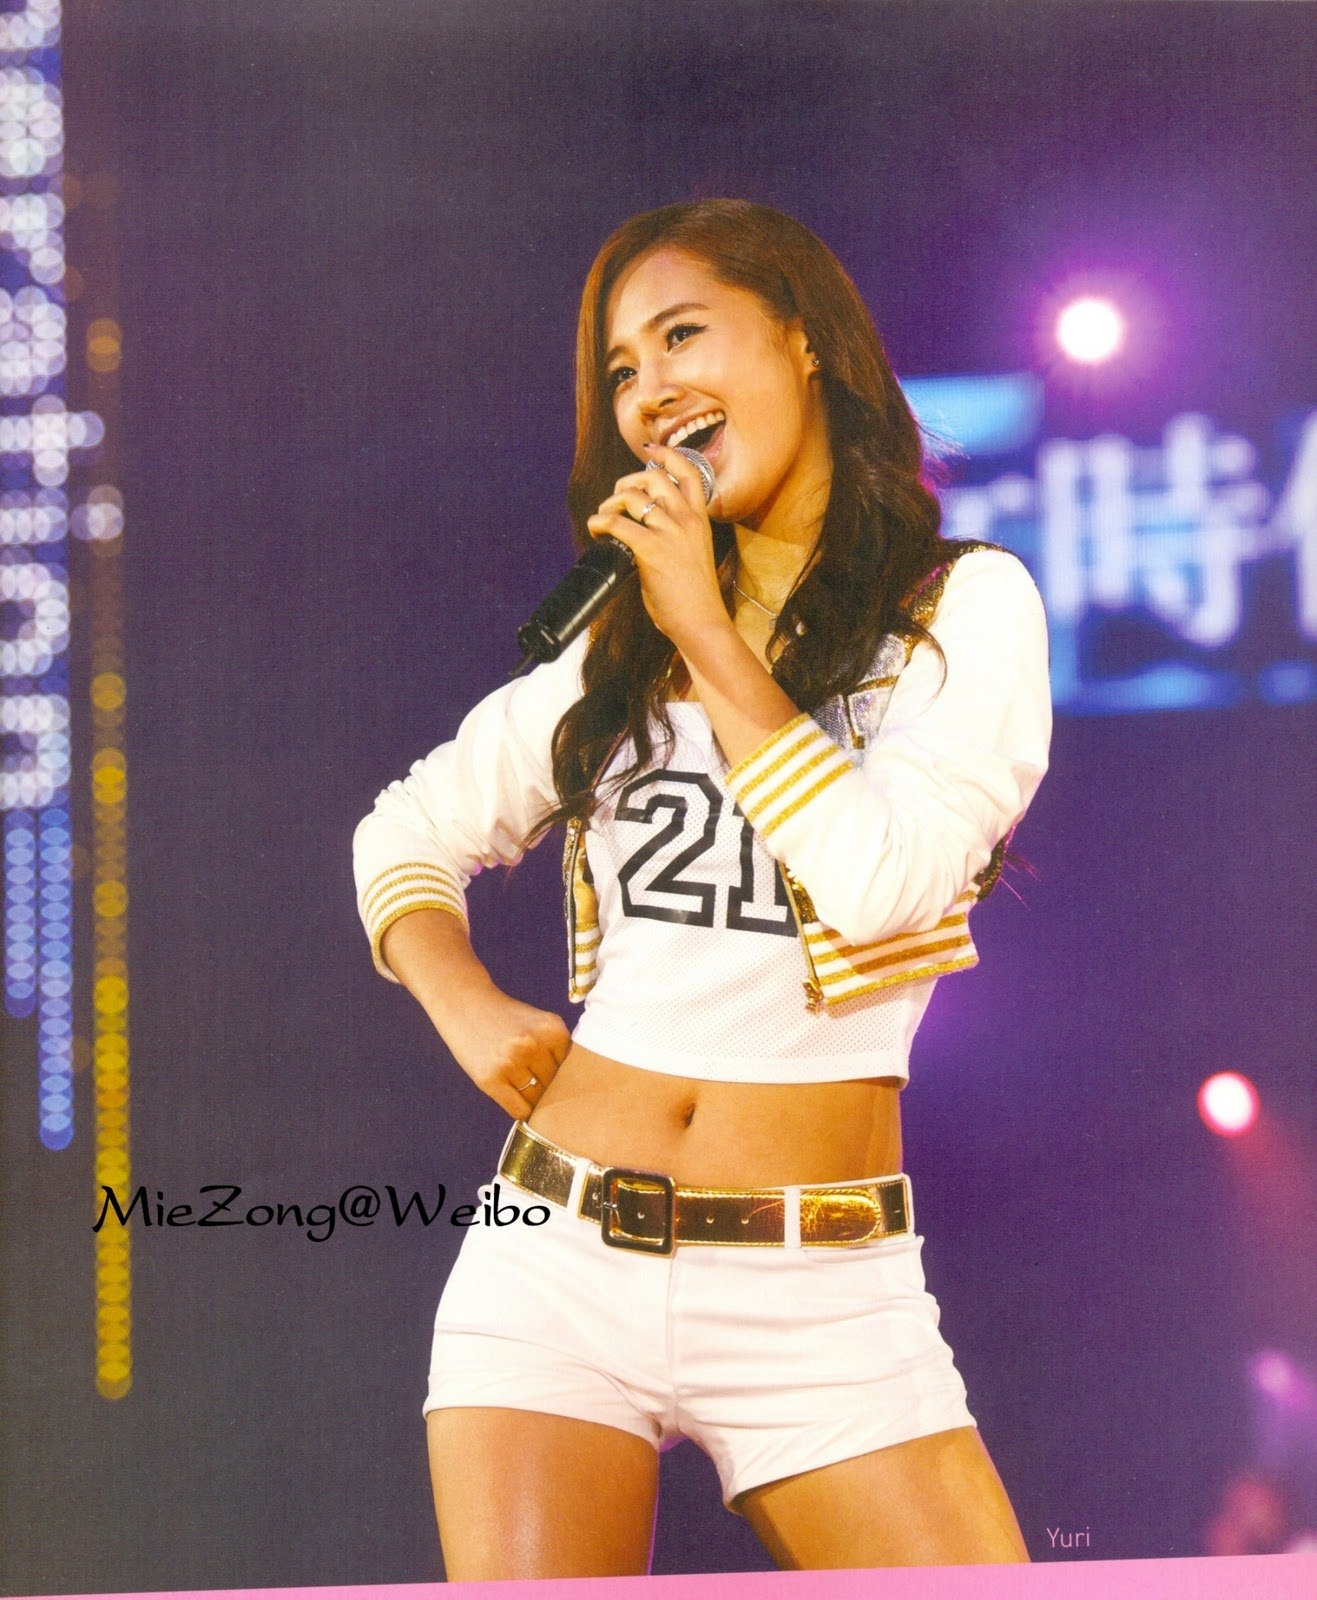 yuri happy face